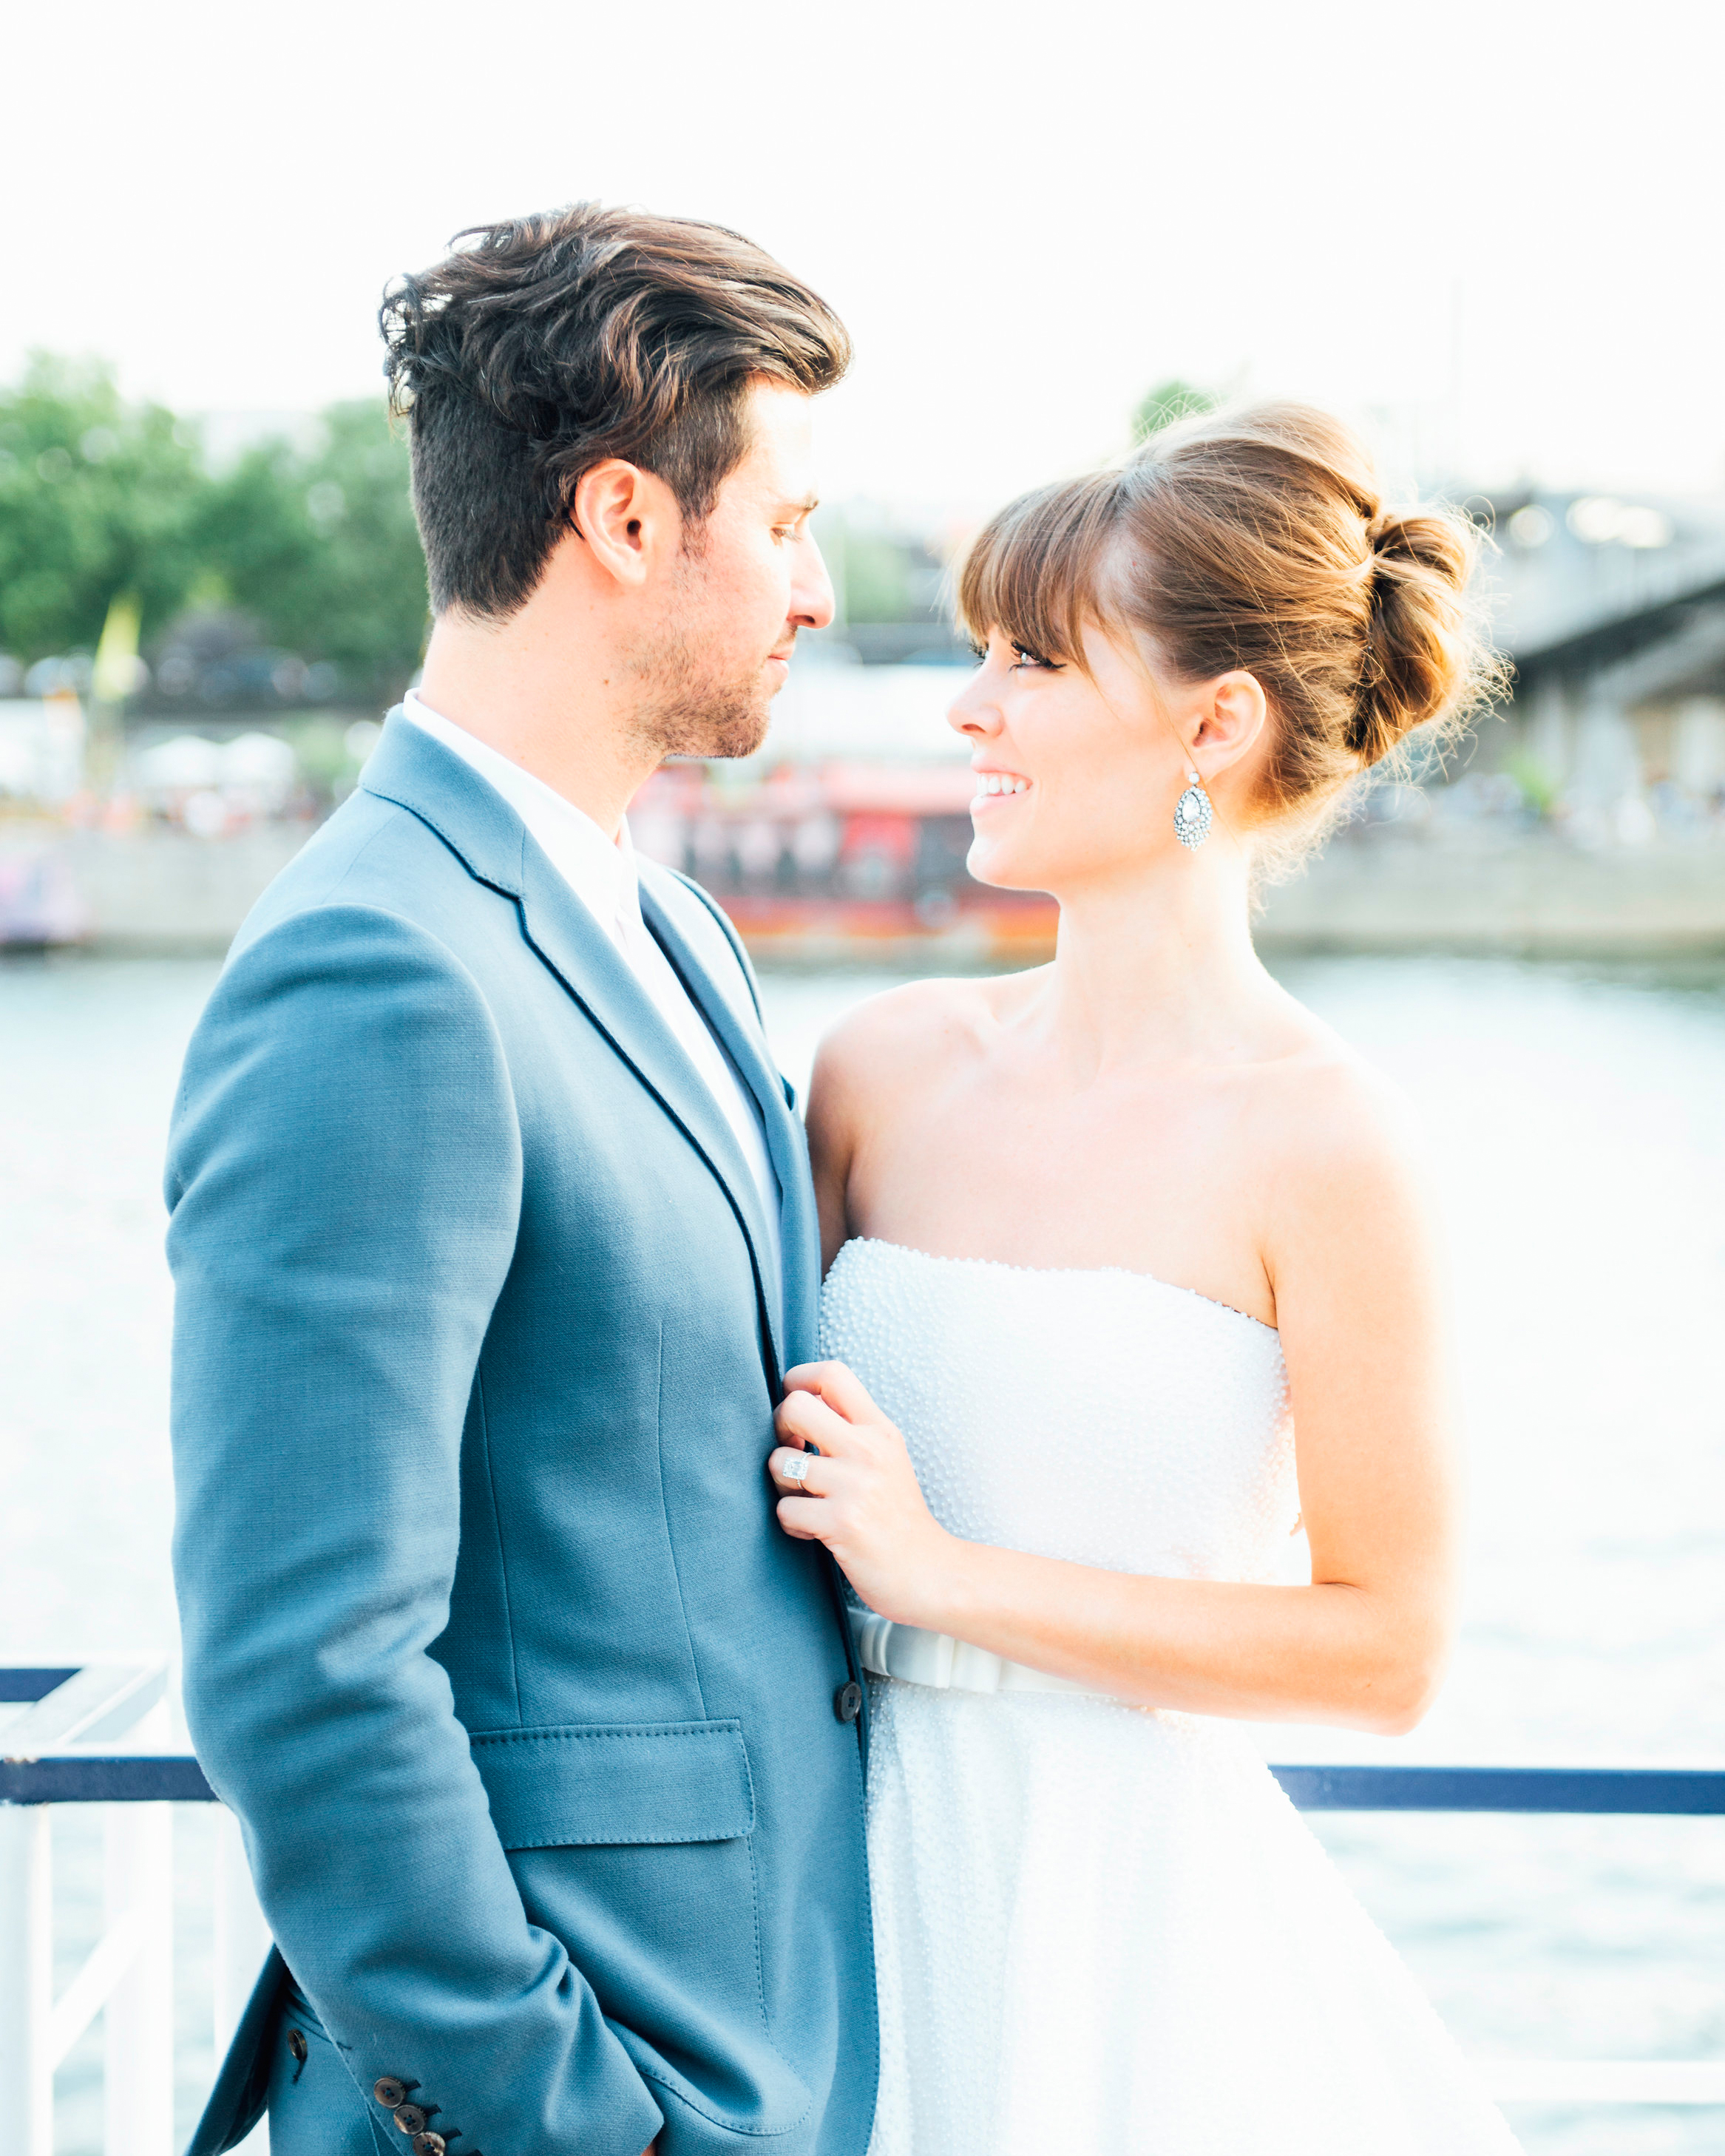 jenny-freddie-boatride-couple-066-s112779-1215.jpg